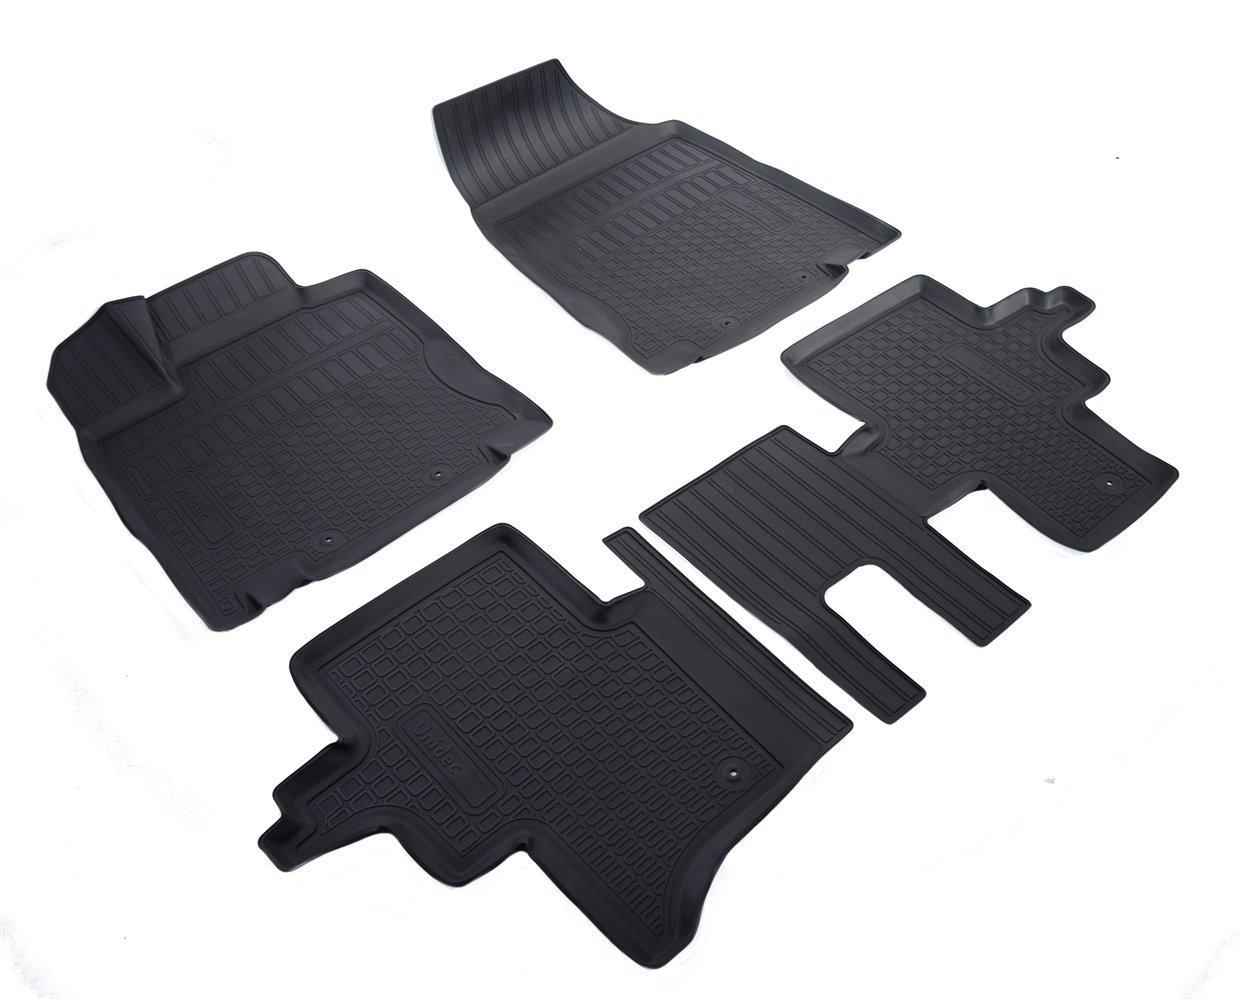 Килимки в салон для Nissan Pathfinder (R52) (14-) (полиур., компл - 4шт) 5мест NPA11-C61-454